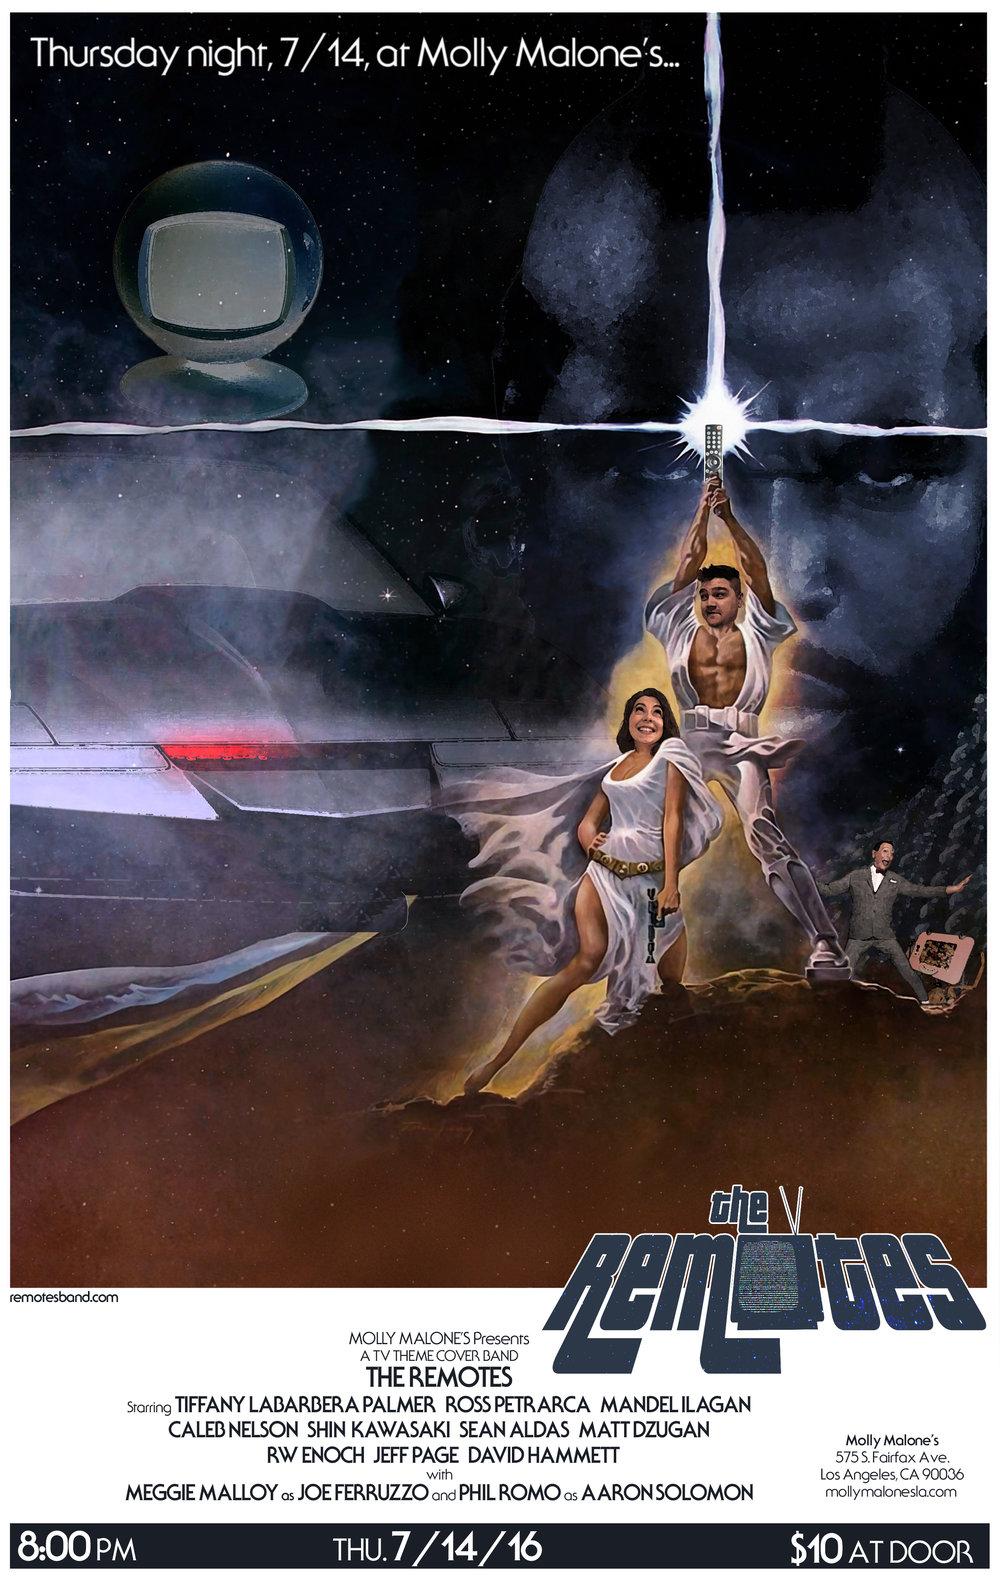 Remotes Star Wars Poster.jpg